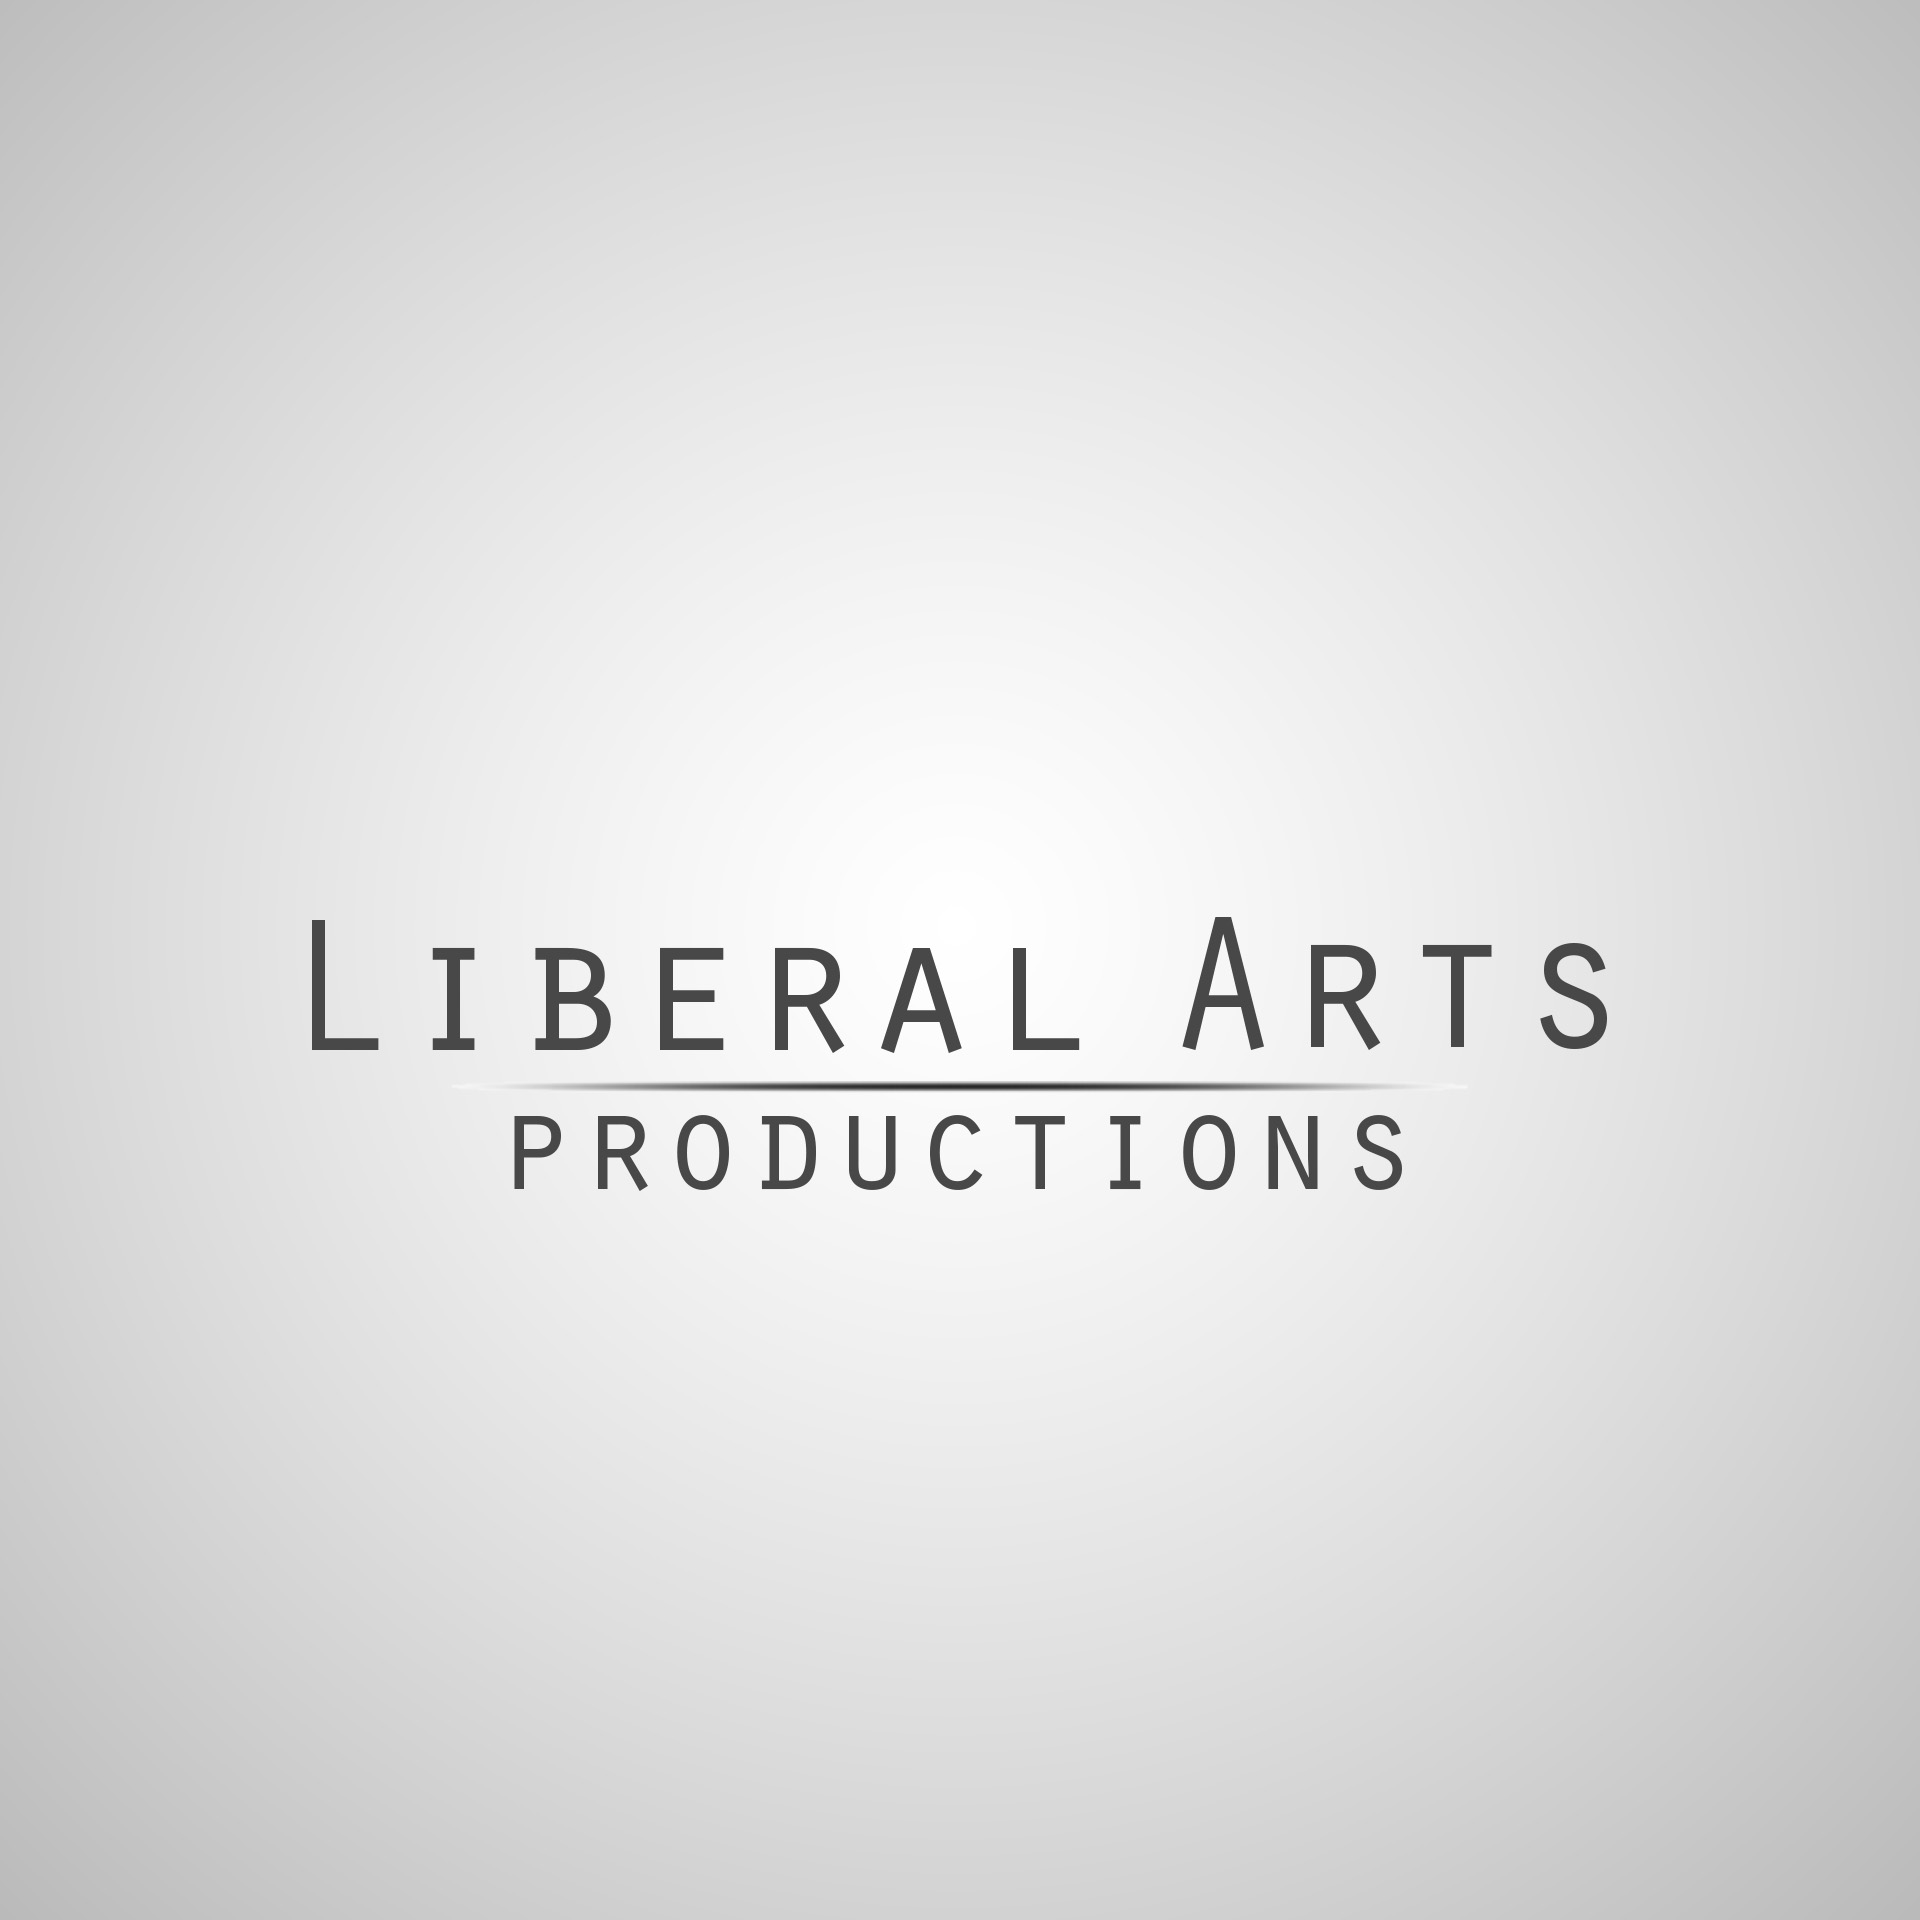 Liberal Arts Productions Job Openings